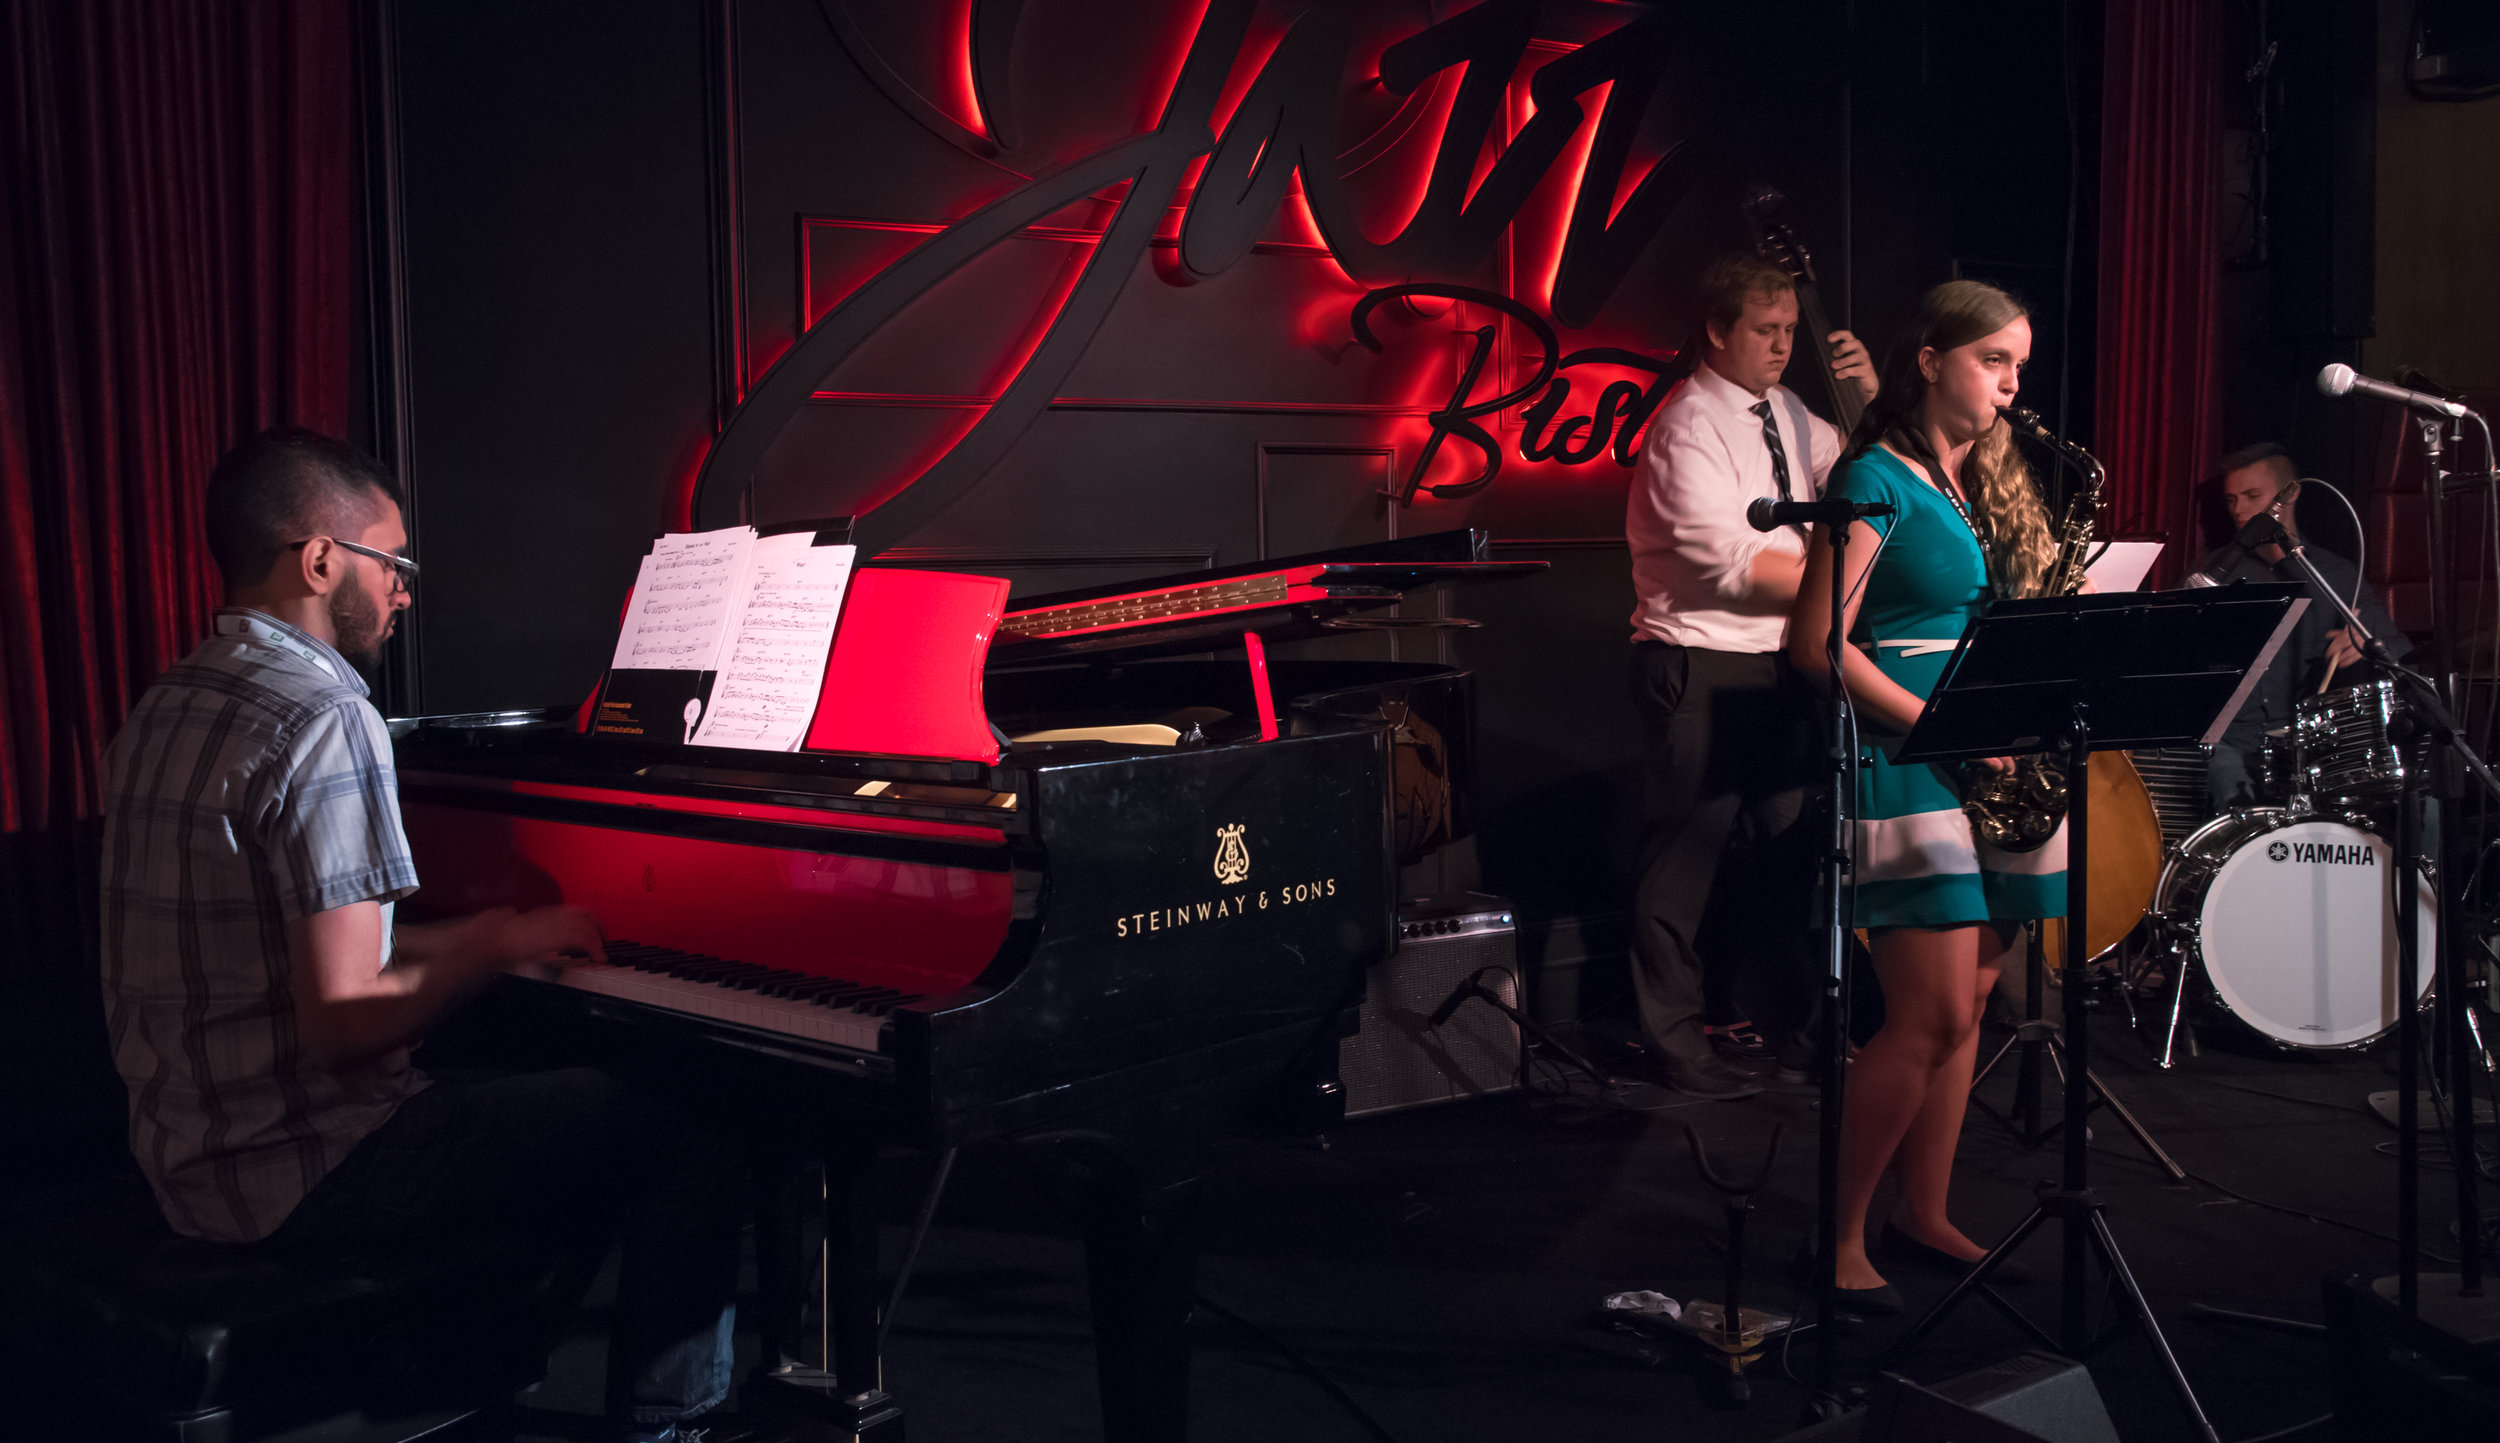 TUJF2018 Opening Ngiht Sophia Smith 1.jpg